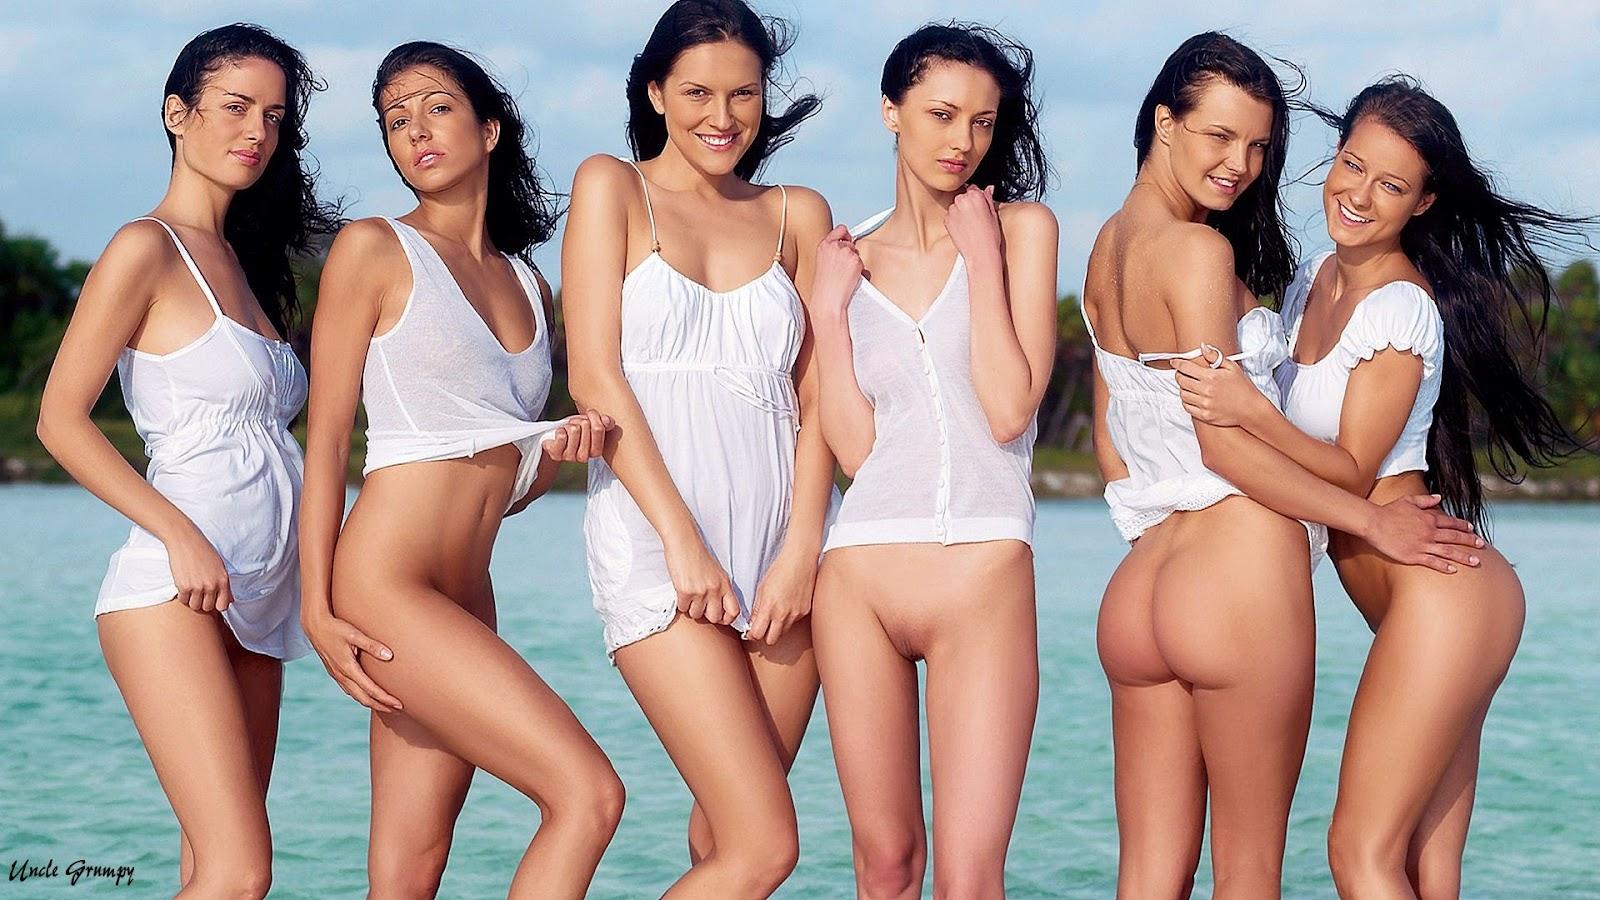 Teen girl bikini sex wallpaper porn picture